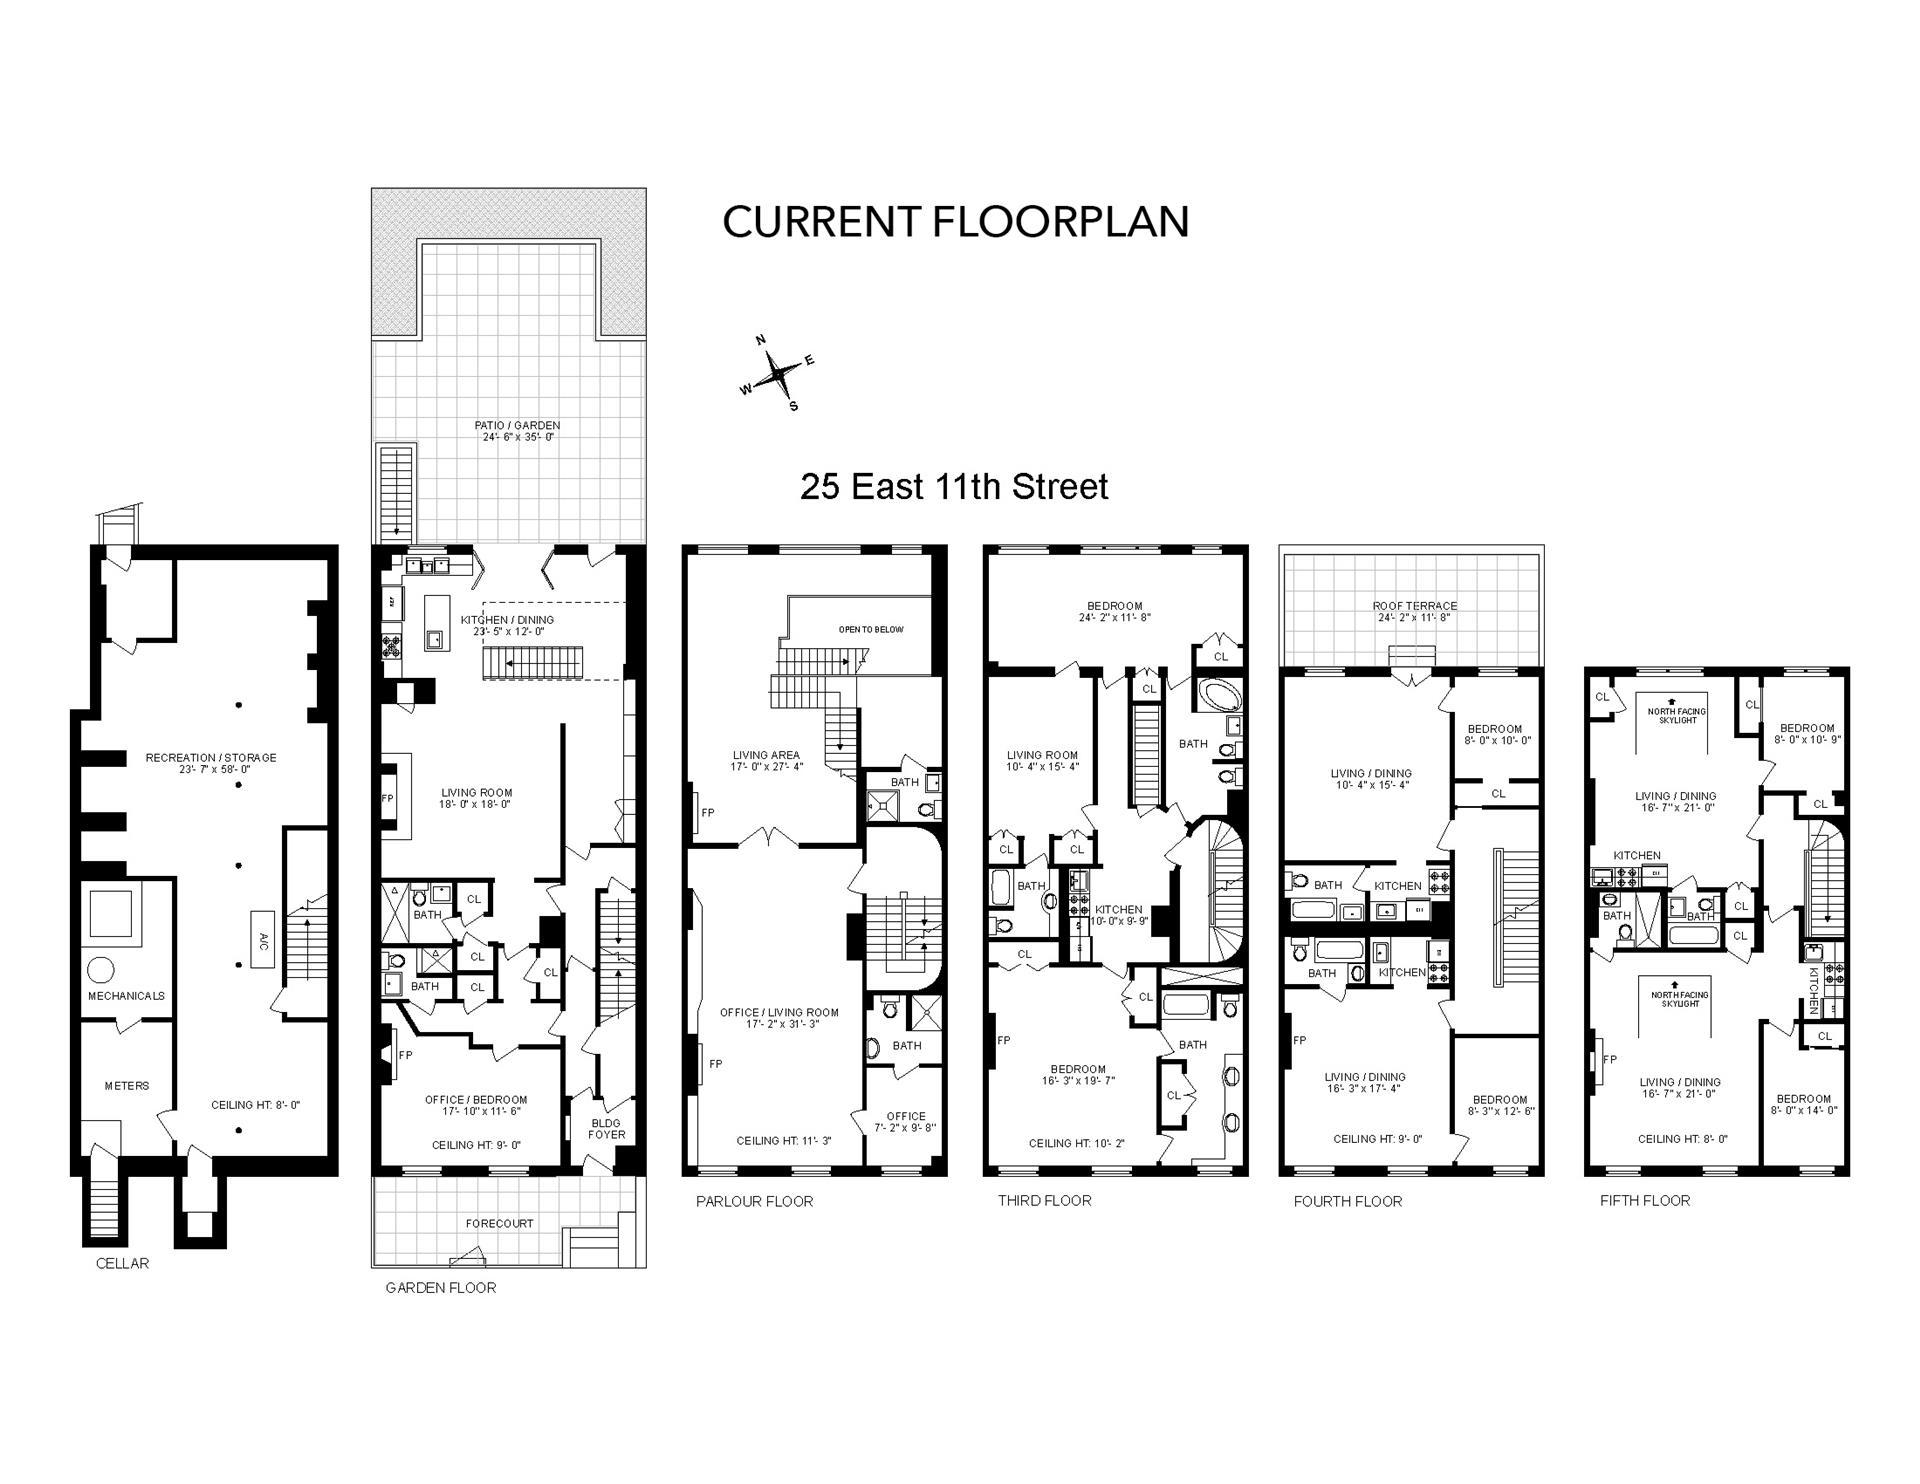 Floor plan of 25 East 11th St - Greenwich Village, New York